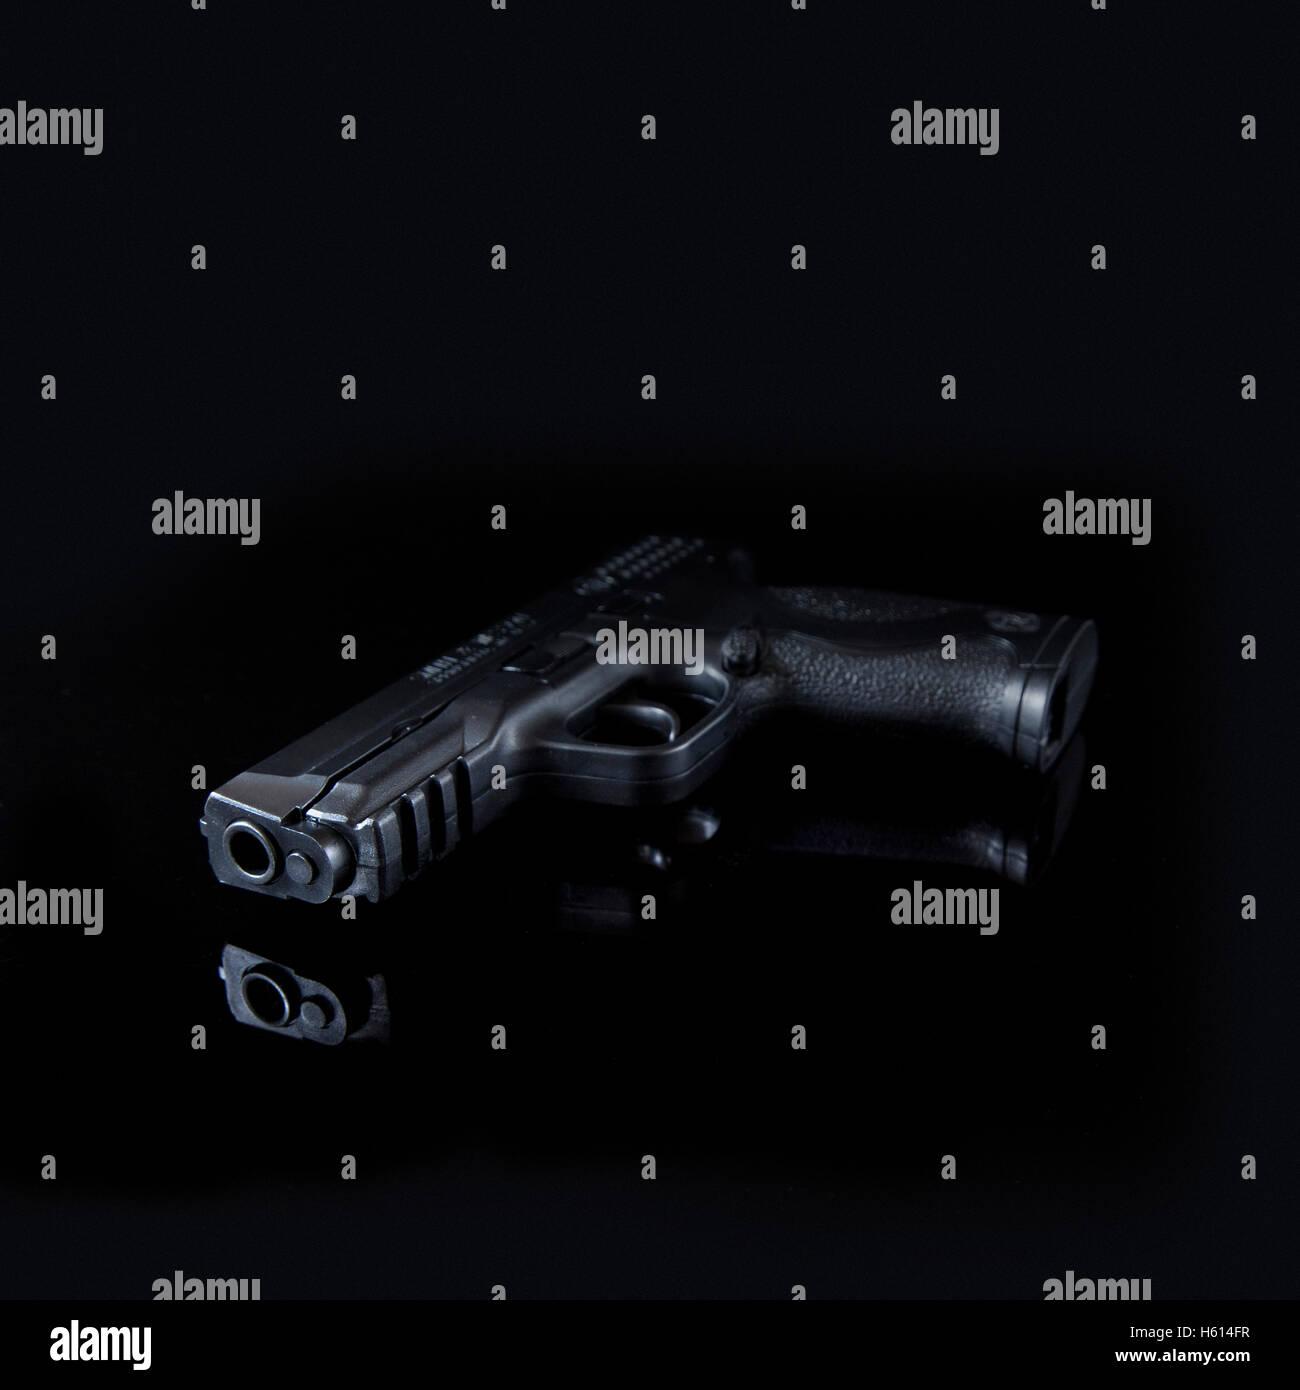 Handgun on Black Background - Stock Image